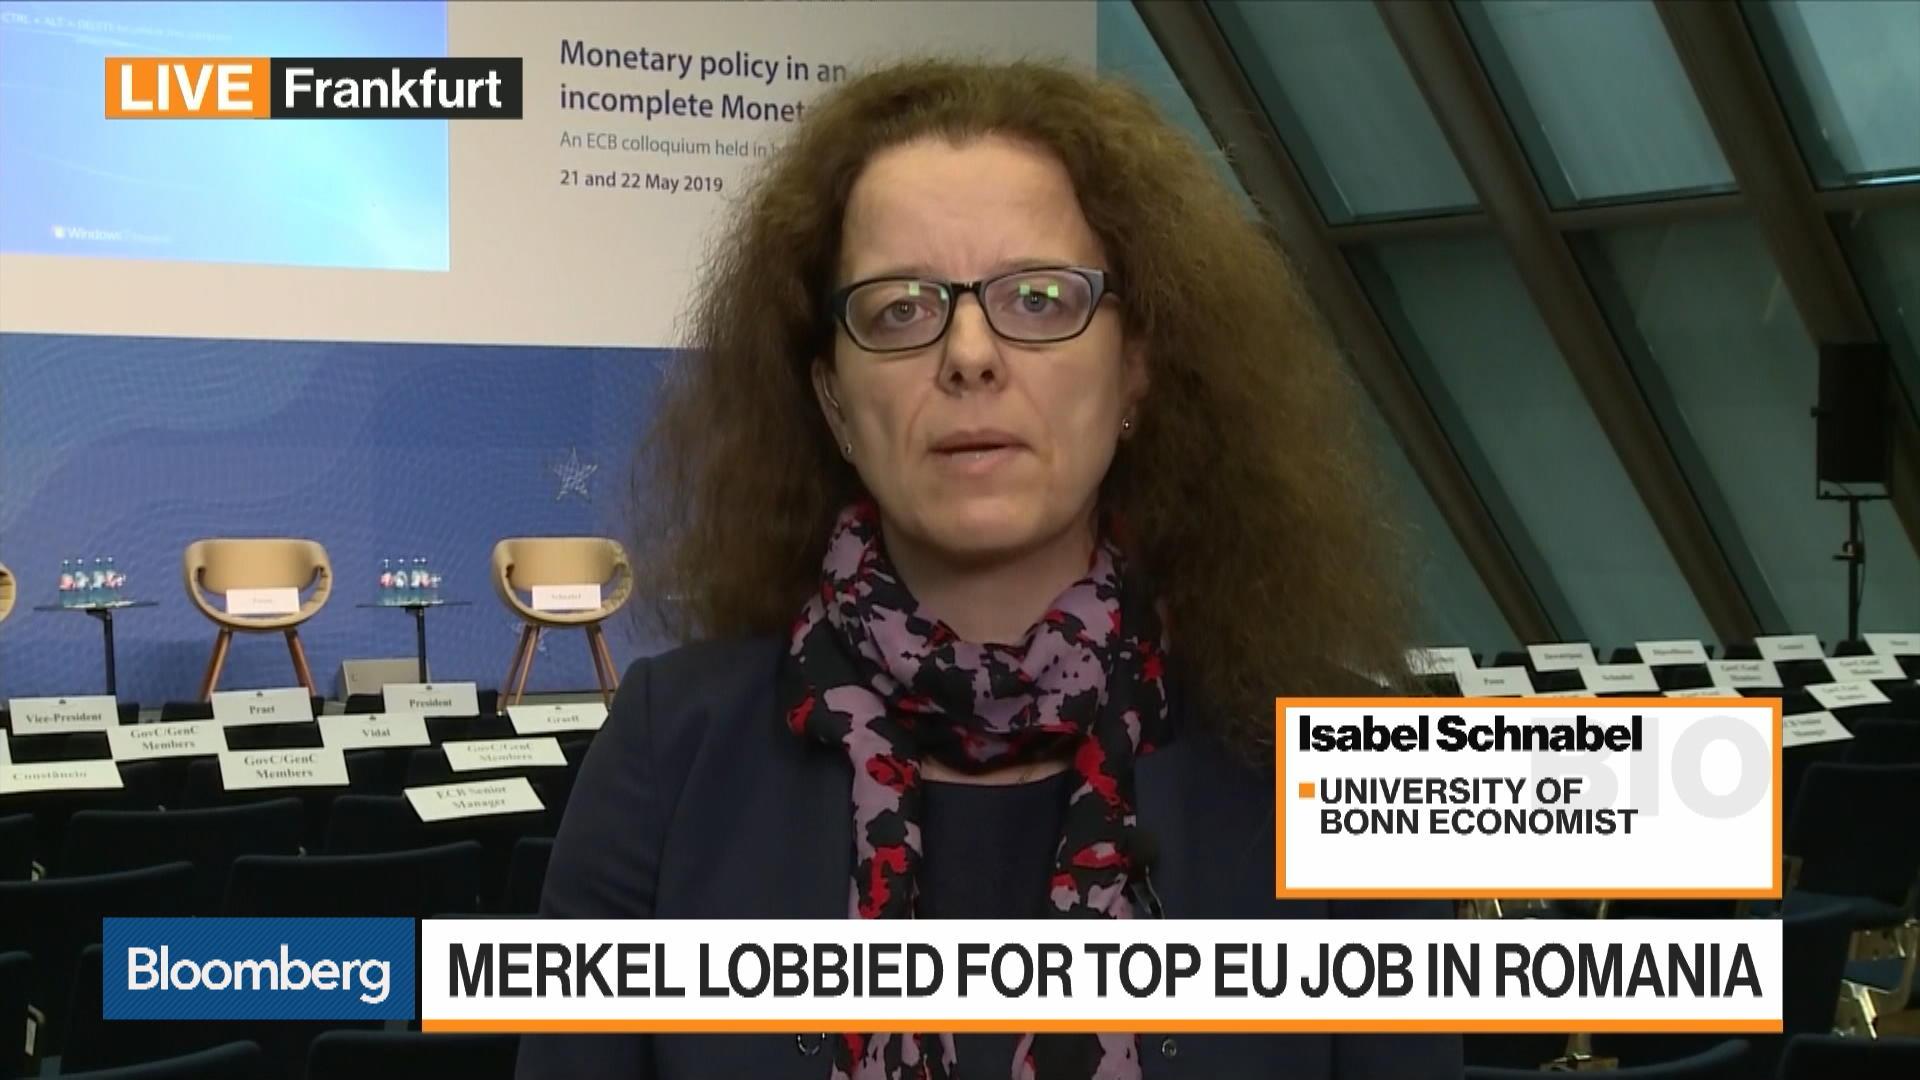 Weidmann Needs to Shift Stance on OMT, German Economic Adviser Schnabel Says